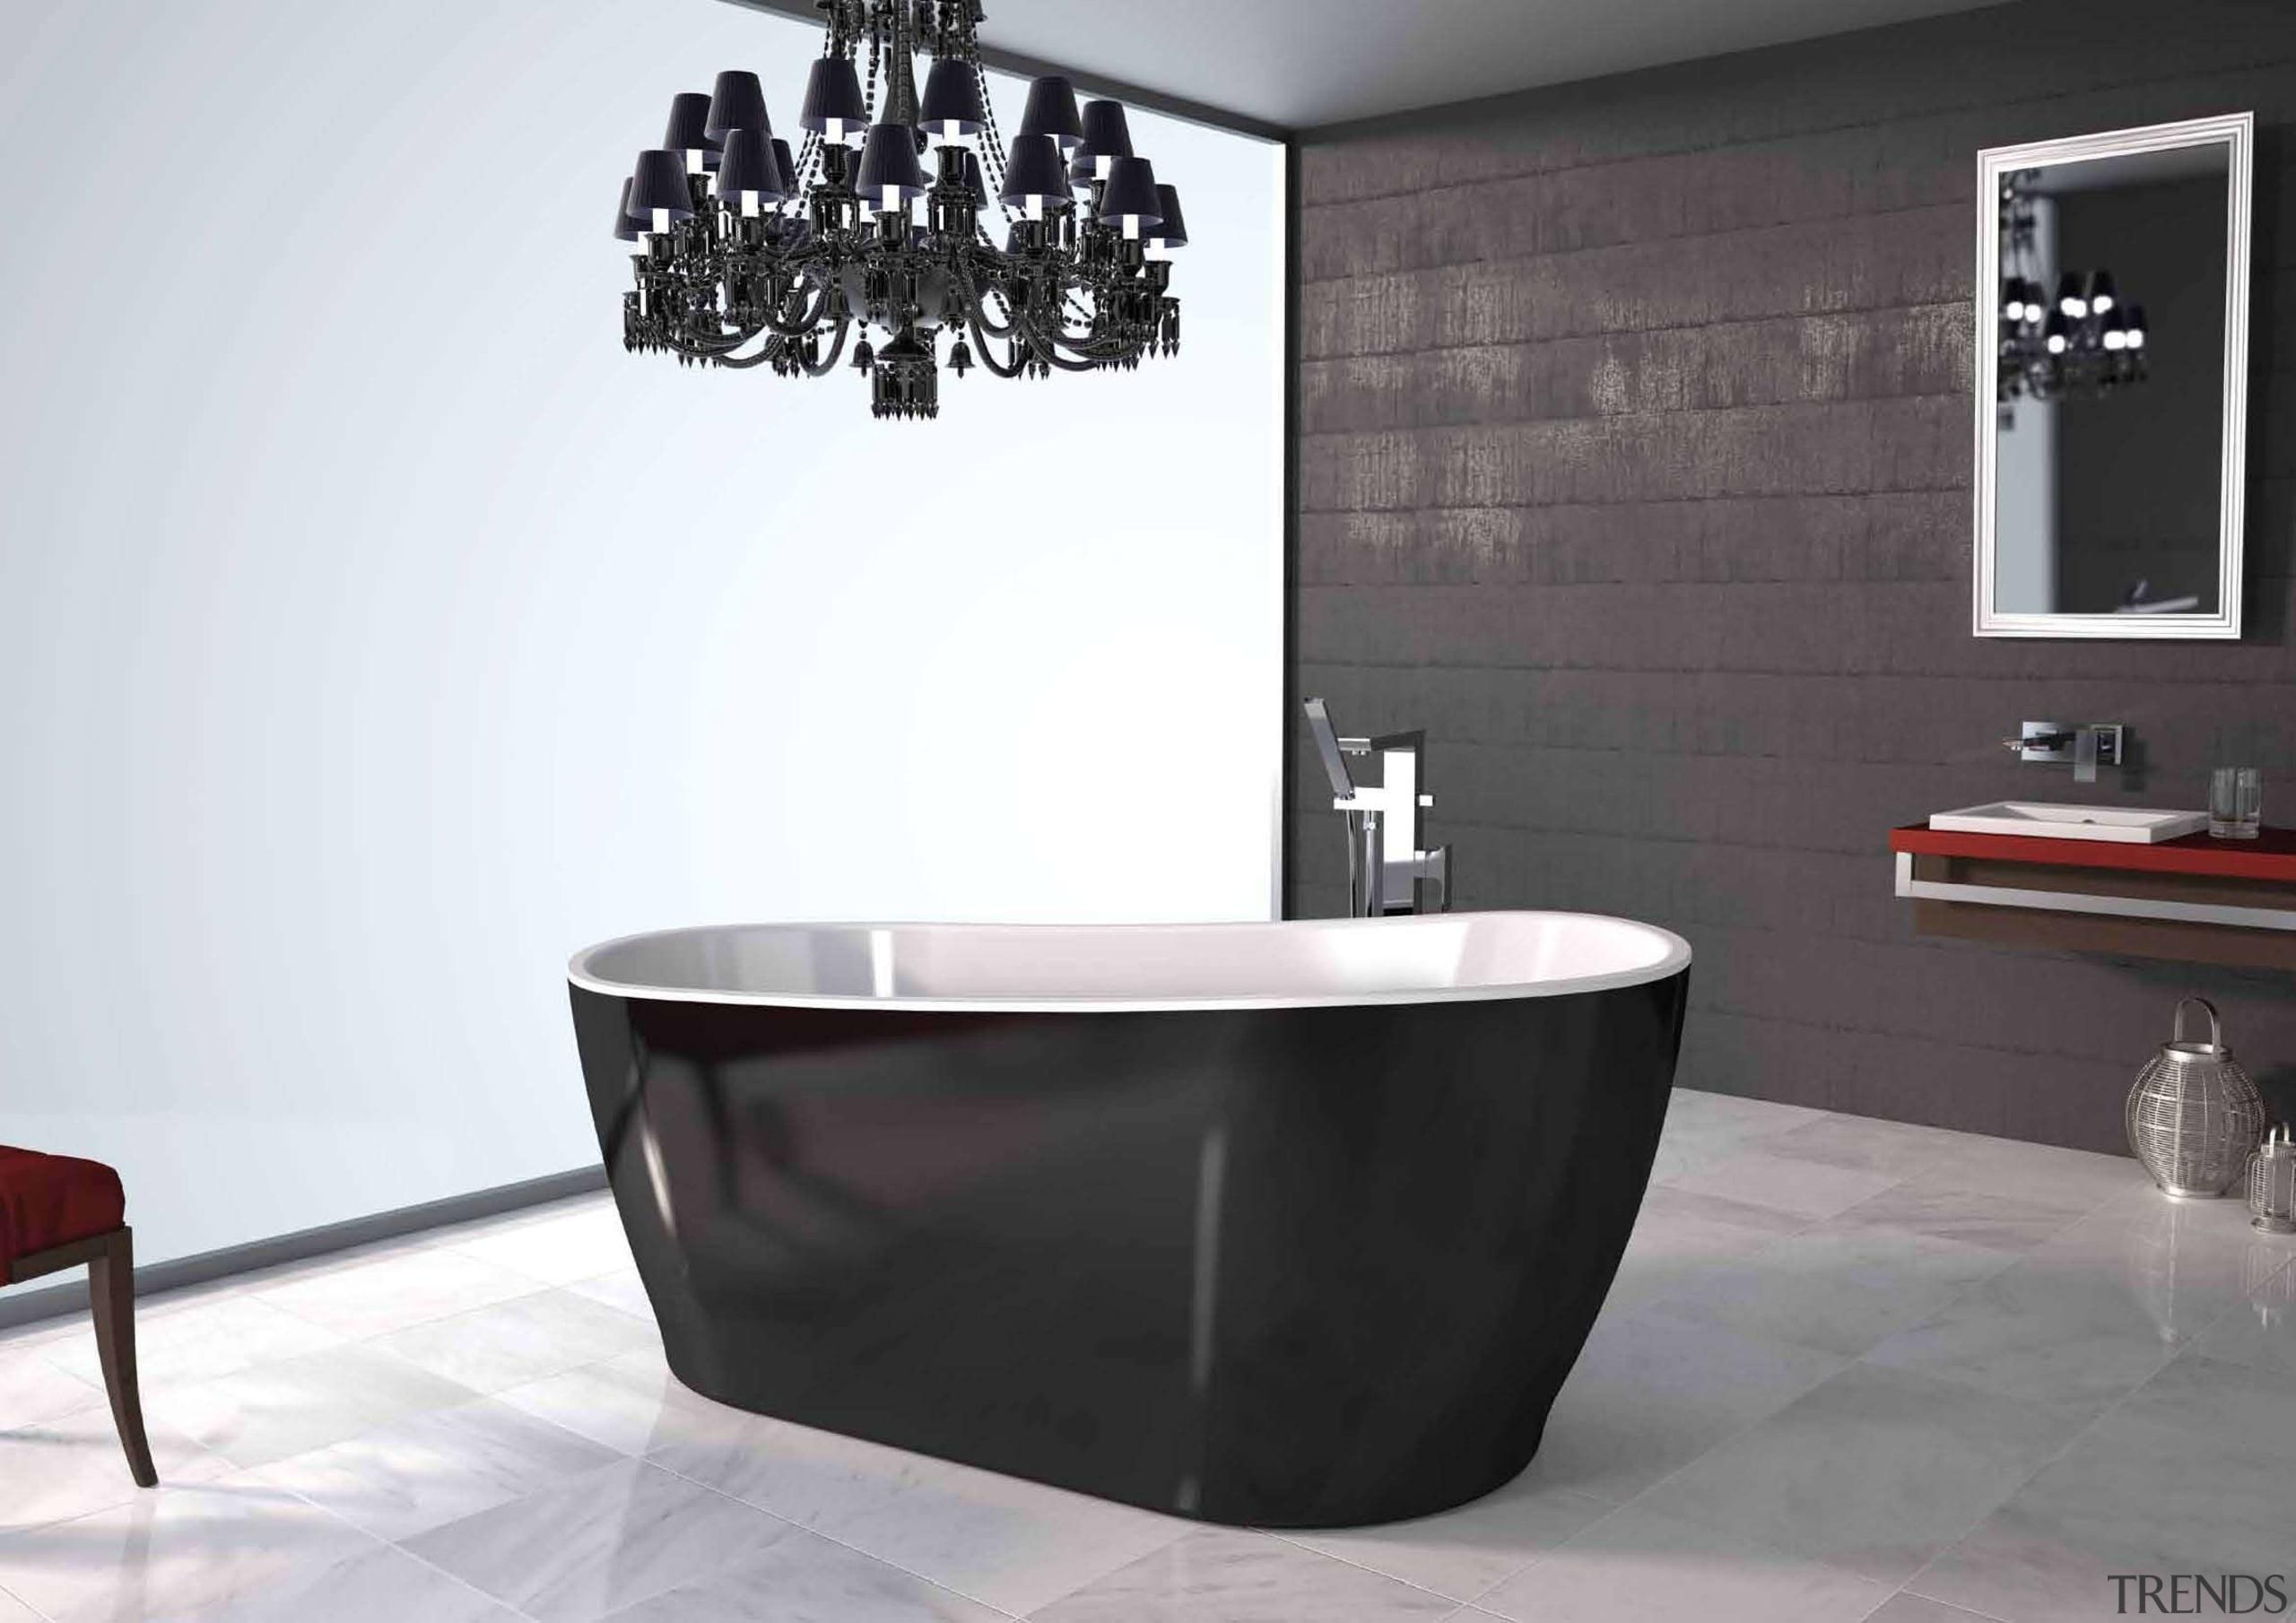 Bathroom ideas that you can find at Home bathroom, bathroom sink, bathtub, ceramic, floor, interior design, plumbing fixture, product design, tap, white, black